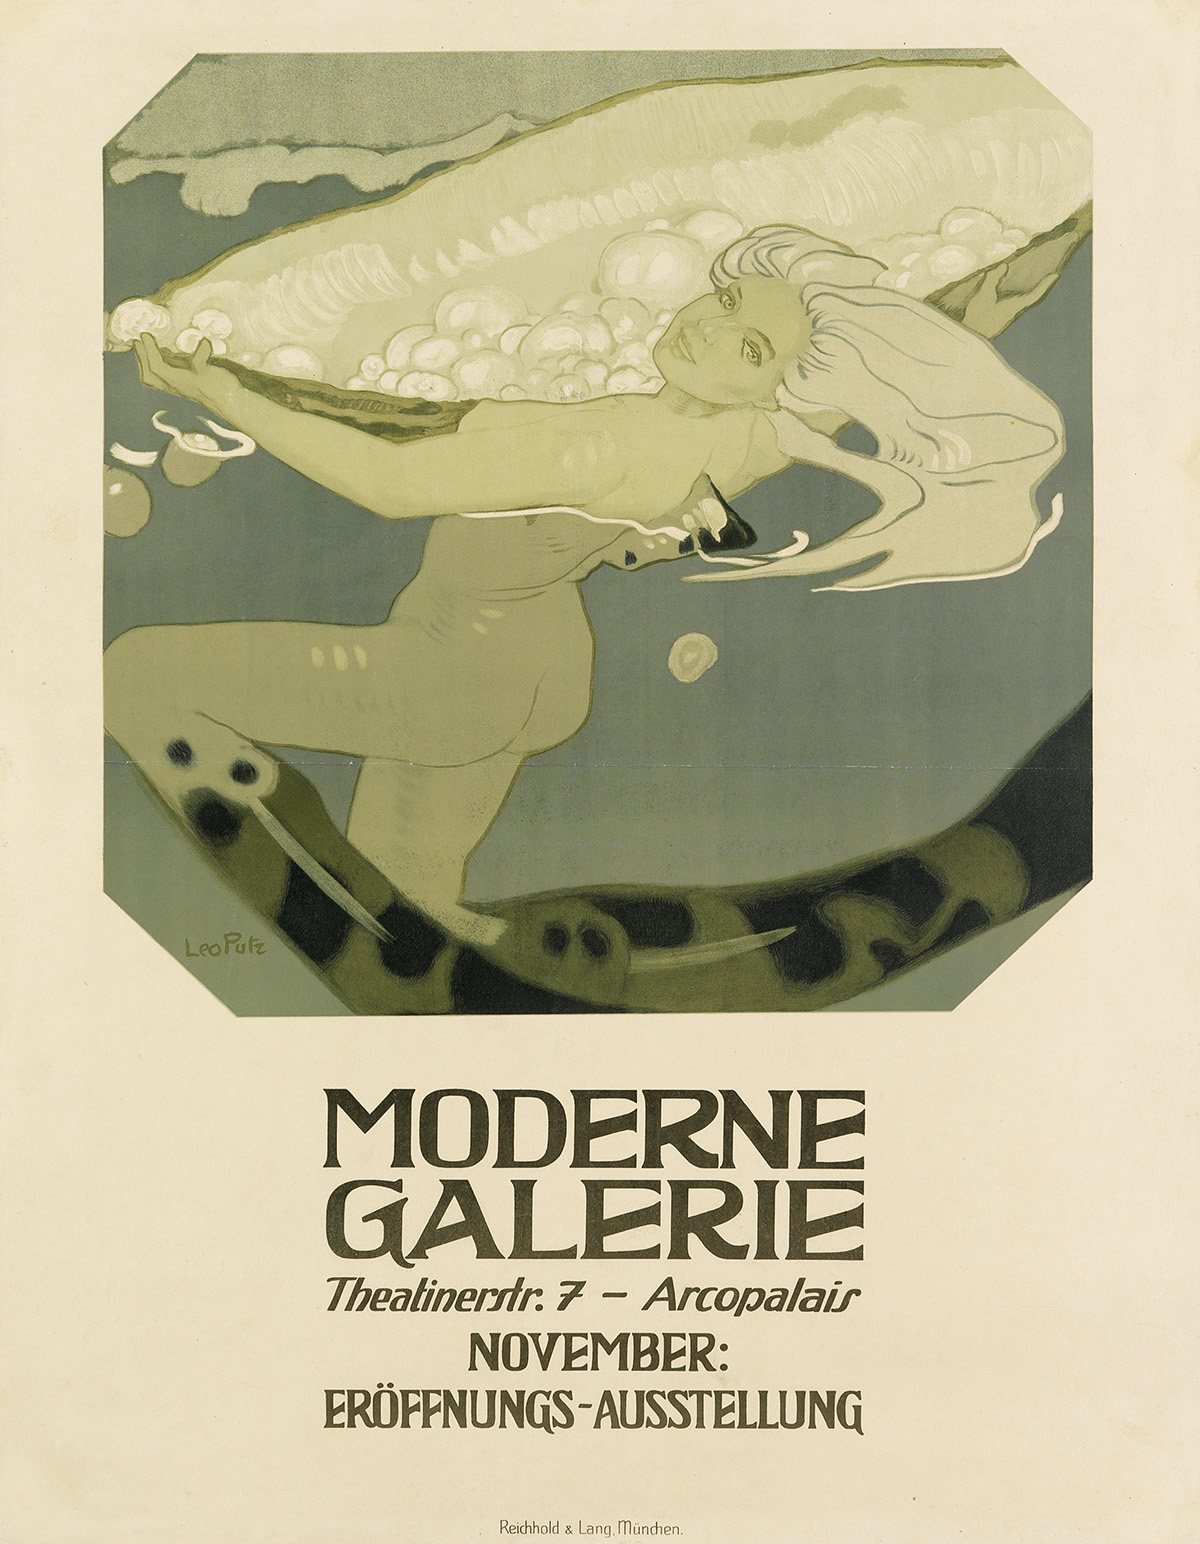 LEO-PUTZ-(1869-1940)-MODERNE-GALERIE-1909-41x31-inches-106x78-cm-Reichhold--Lang-Munich